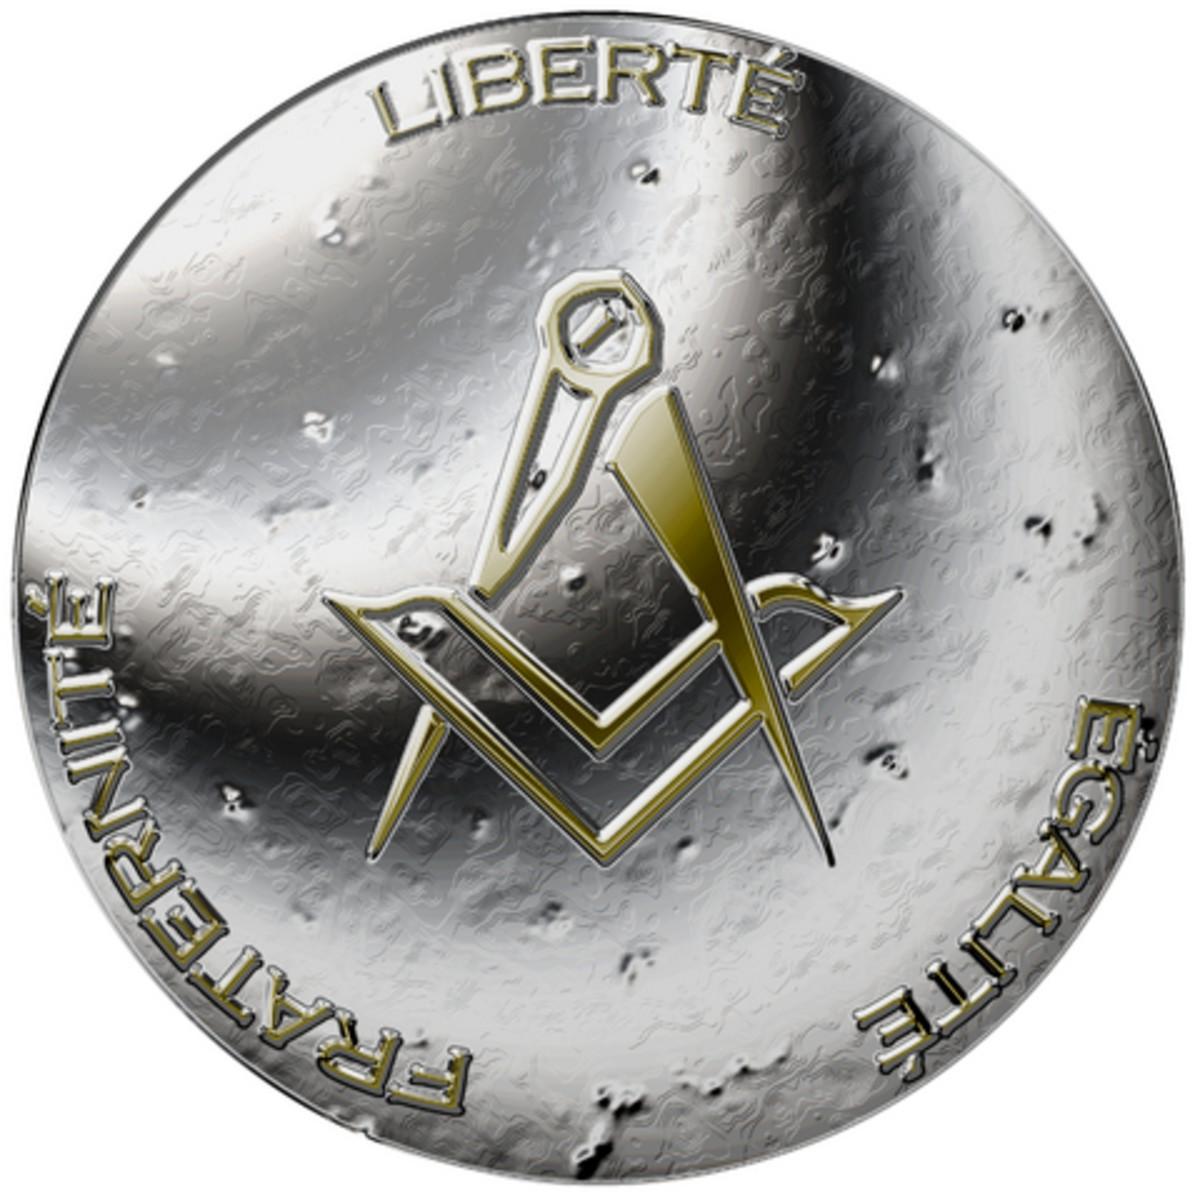 Mason coin.  Photo by Fotografiker@Dreamstime.com